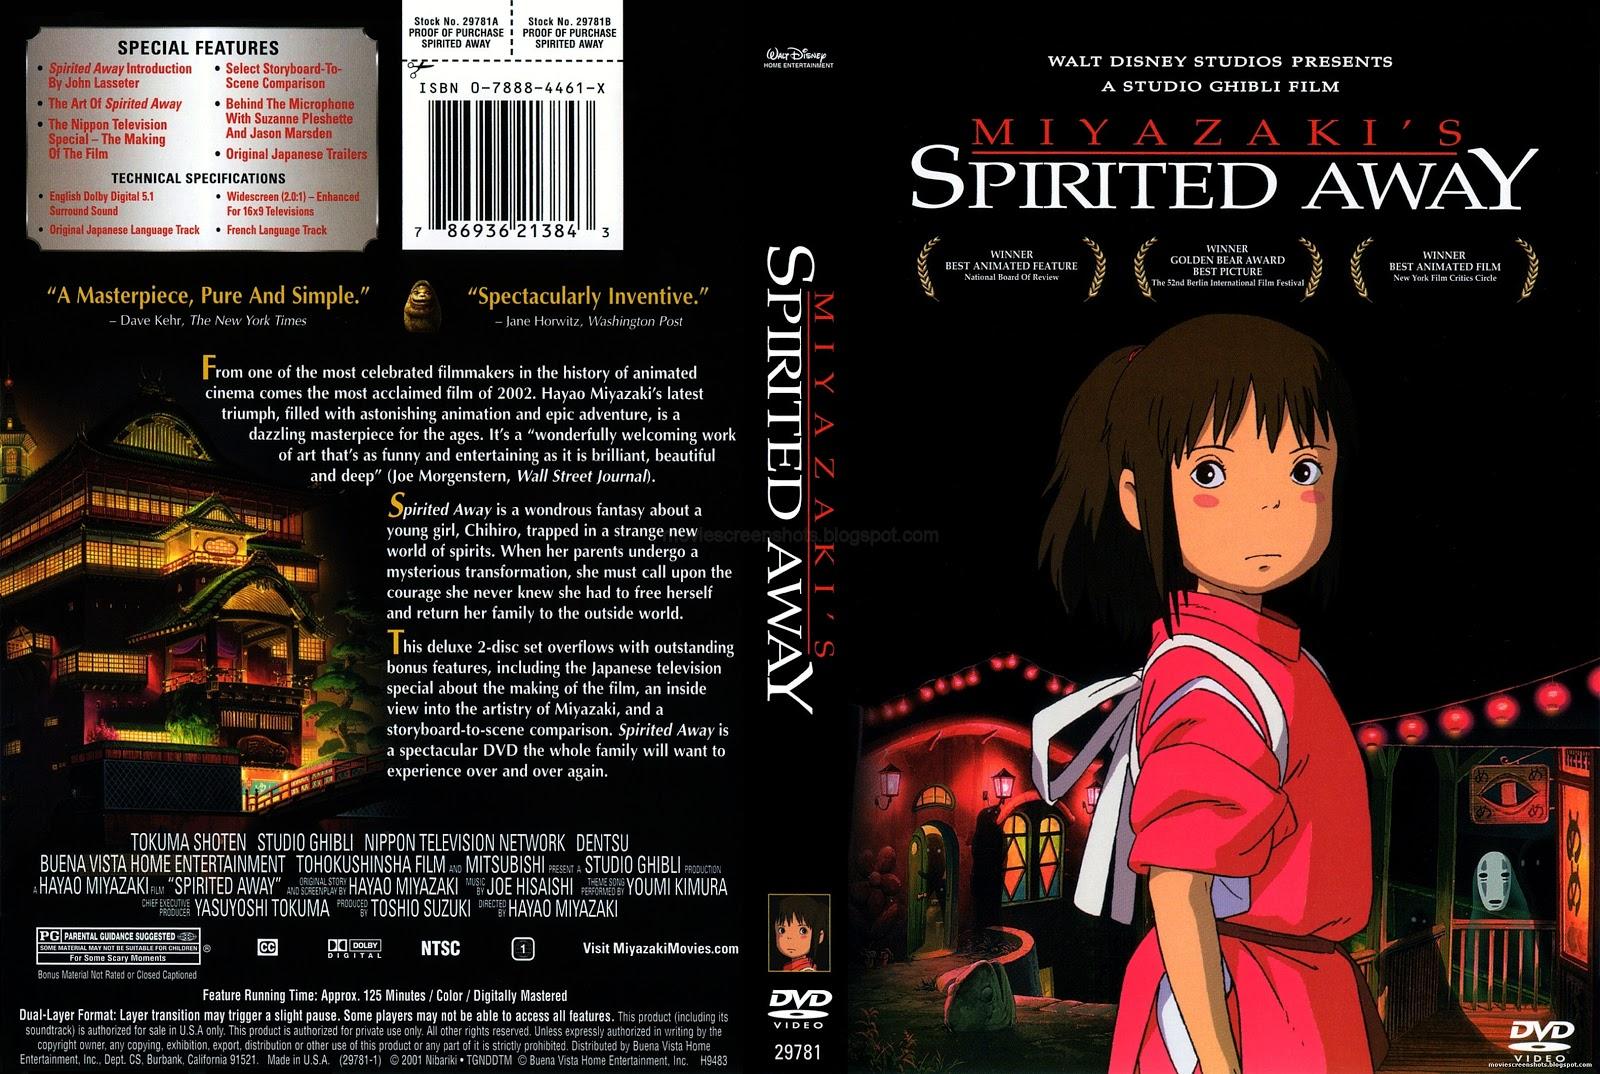 vagebond u0026 39 s movie screenshots  spirited away  2001